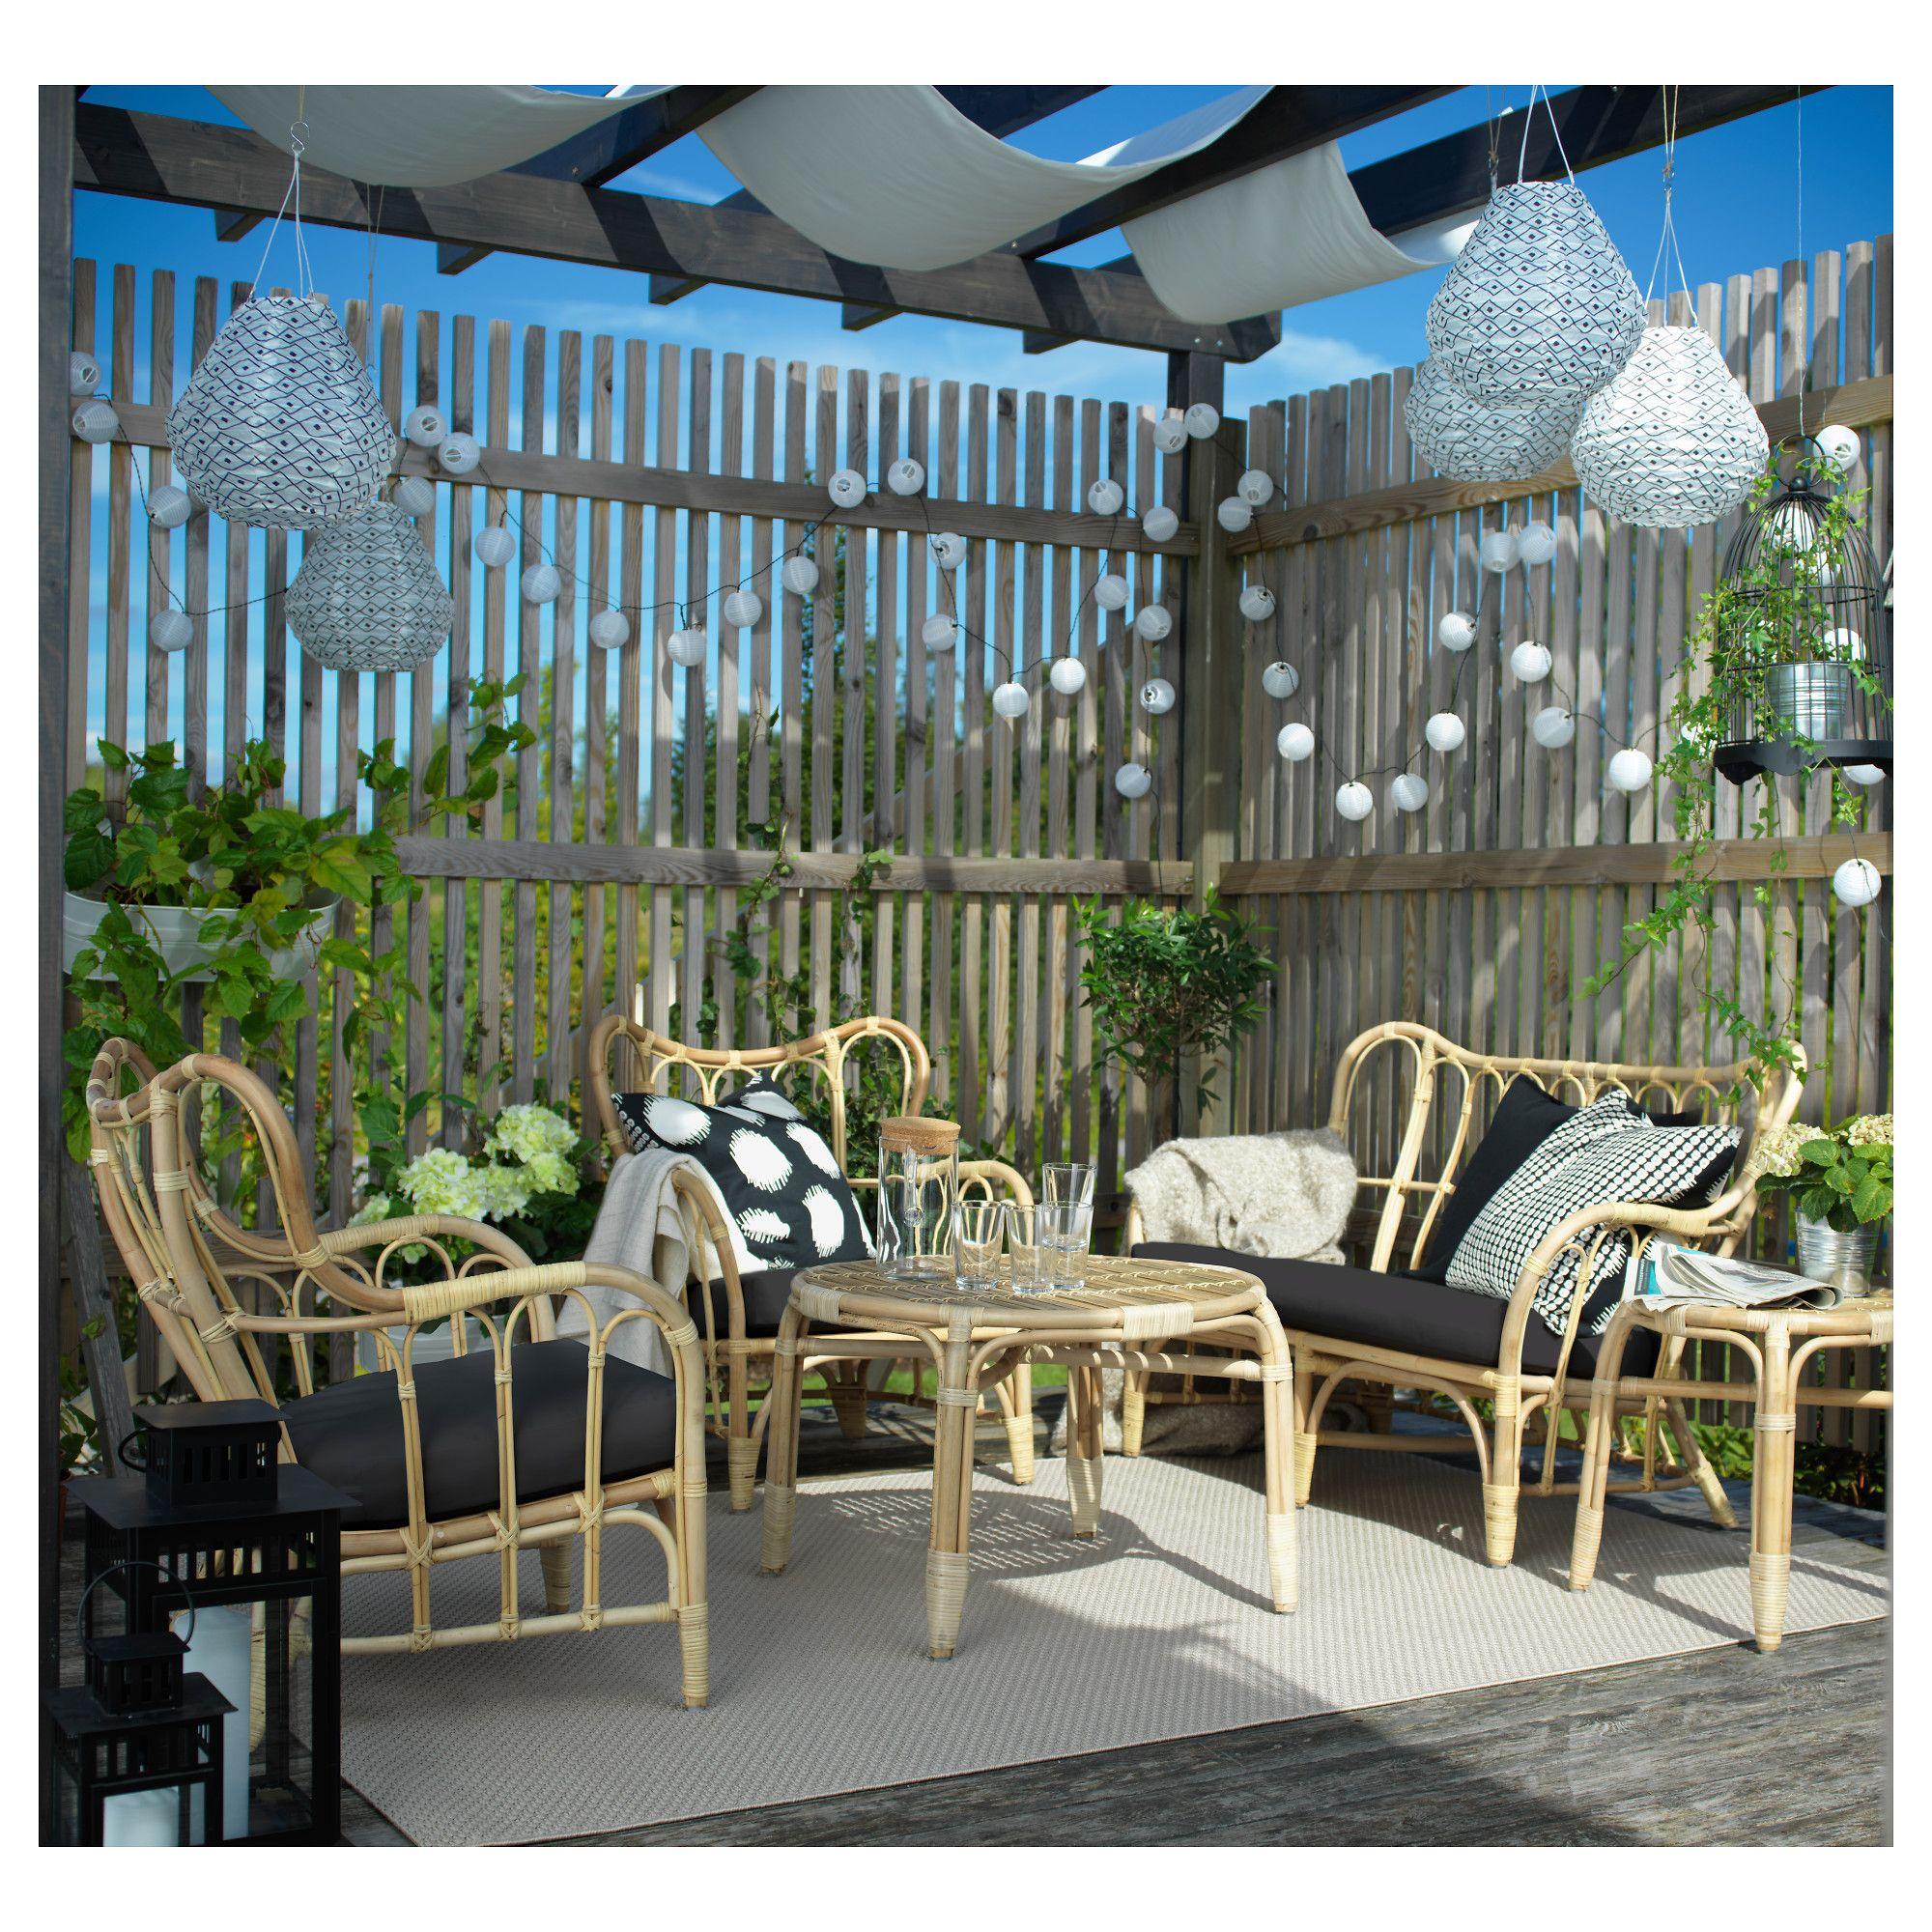 0ff0f597bf7a372e263830f9e2c1a618 Meilleur De De Ikea Table Jardin Conception